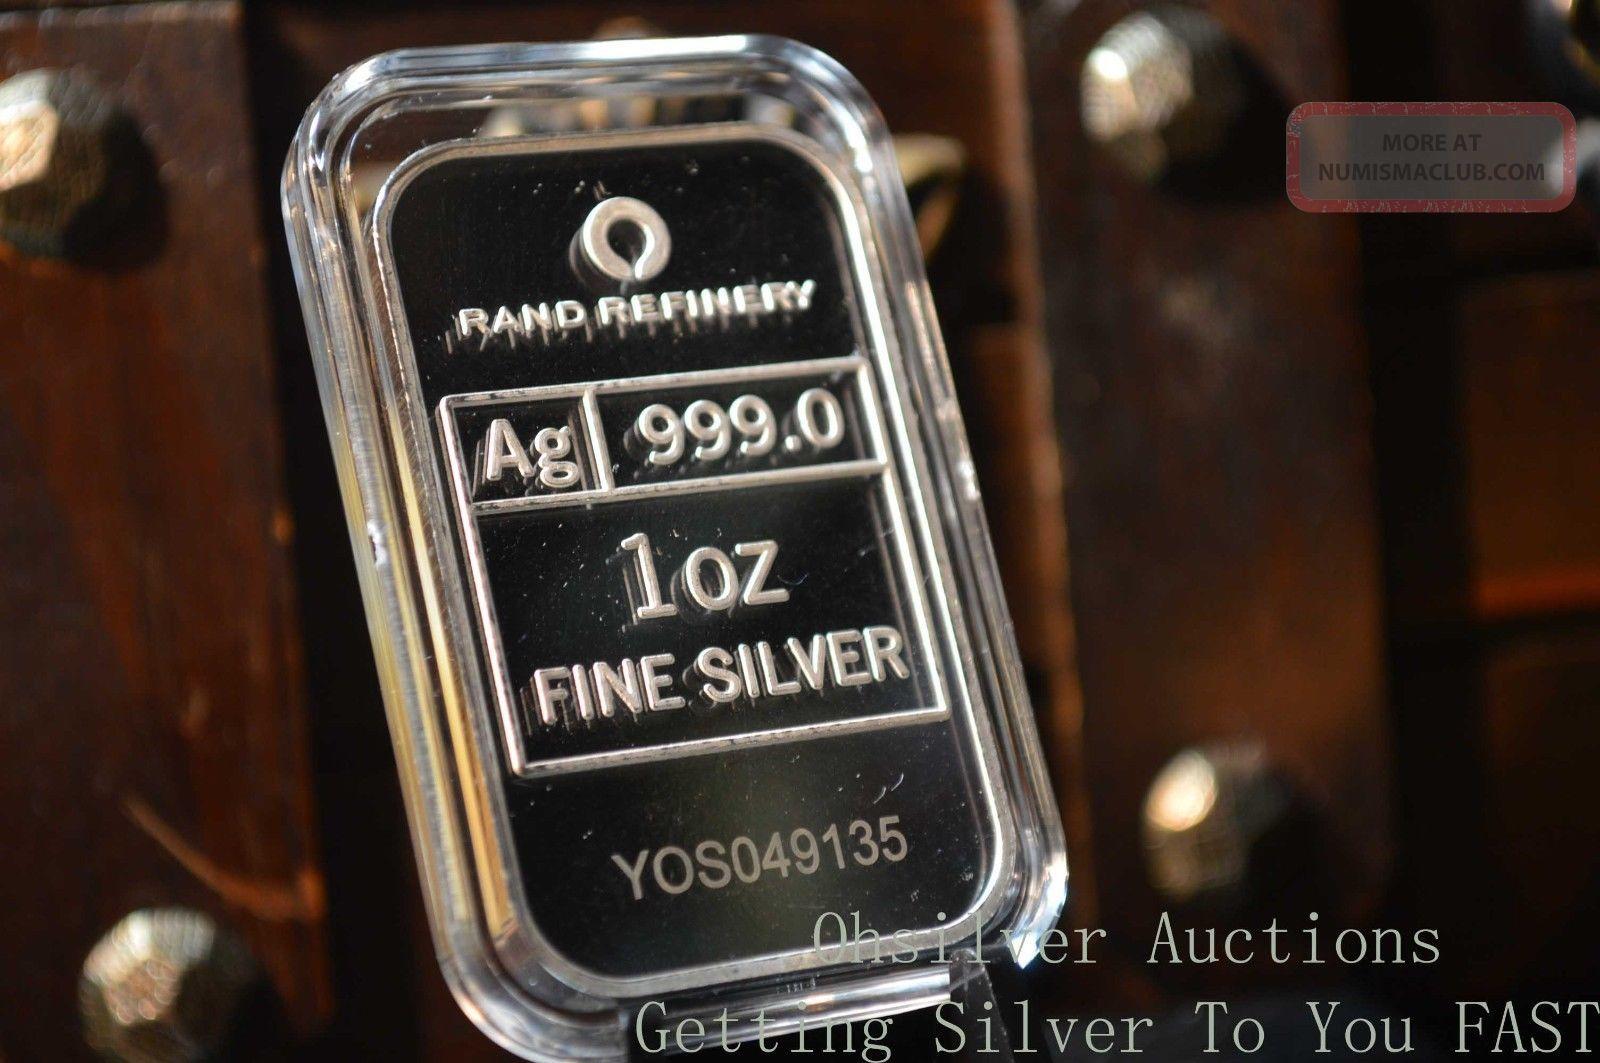 1 Oz Pure Silver Bar 999 Fine Silver Bullion 2013 Year Of